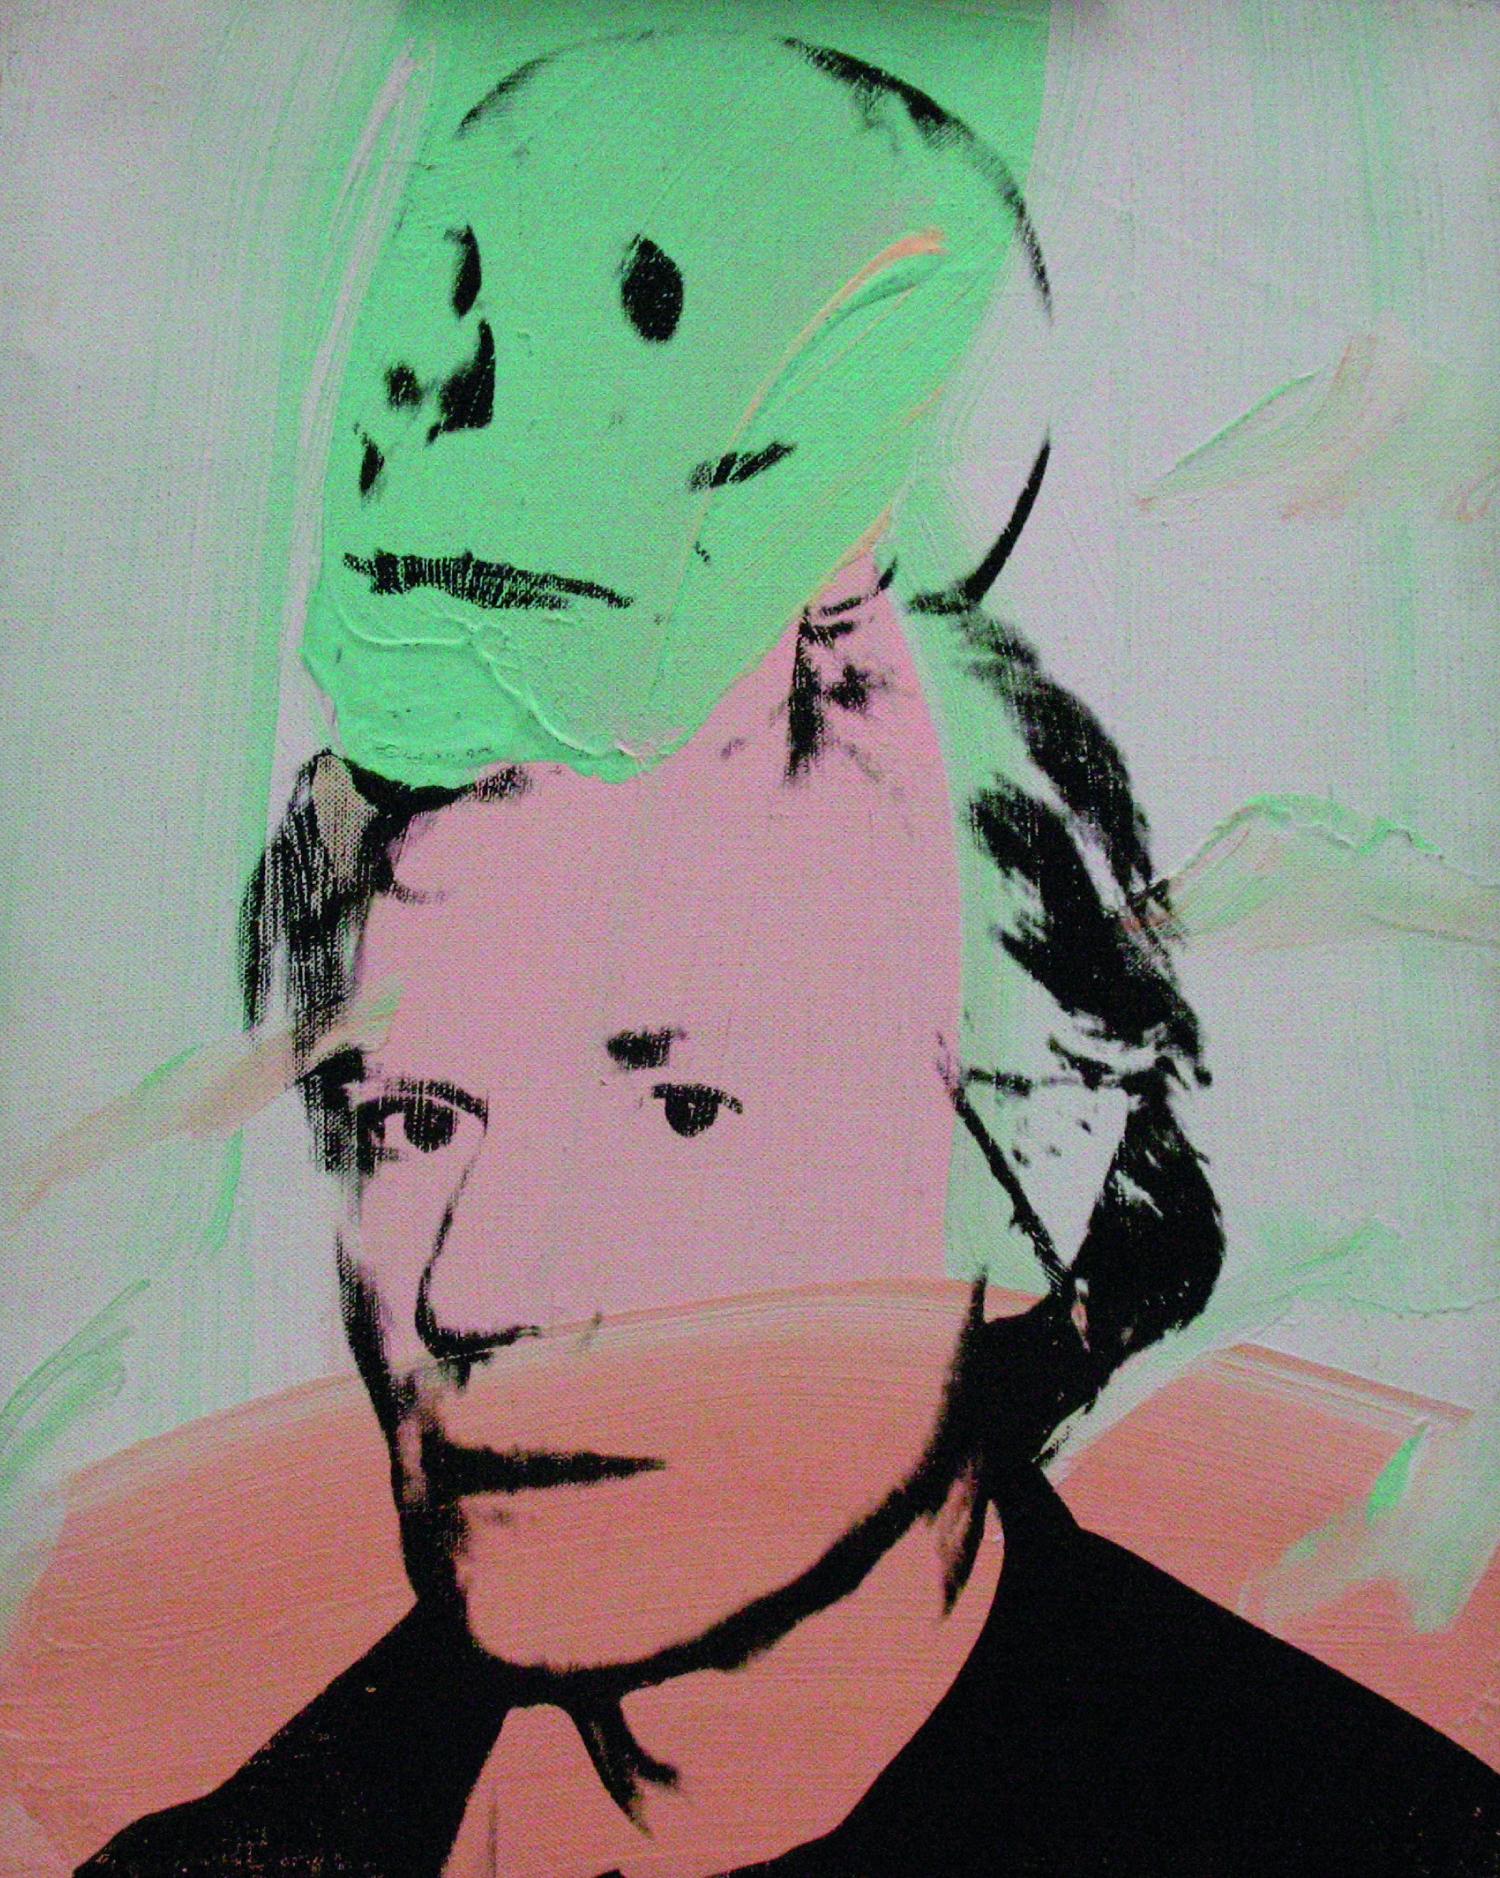 Andy Warhol ... Andy Warhol Self Portrait With Skull